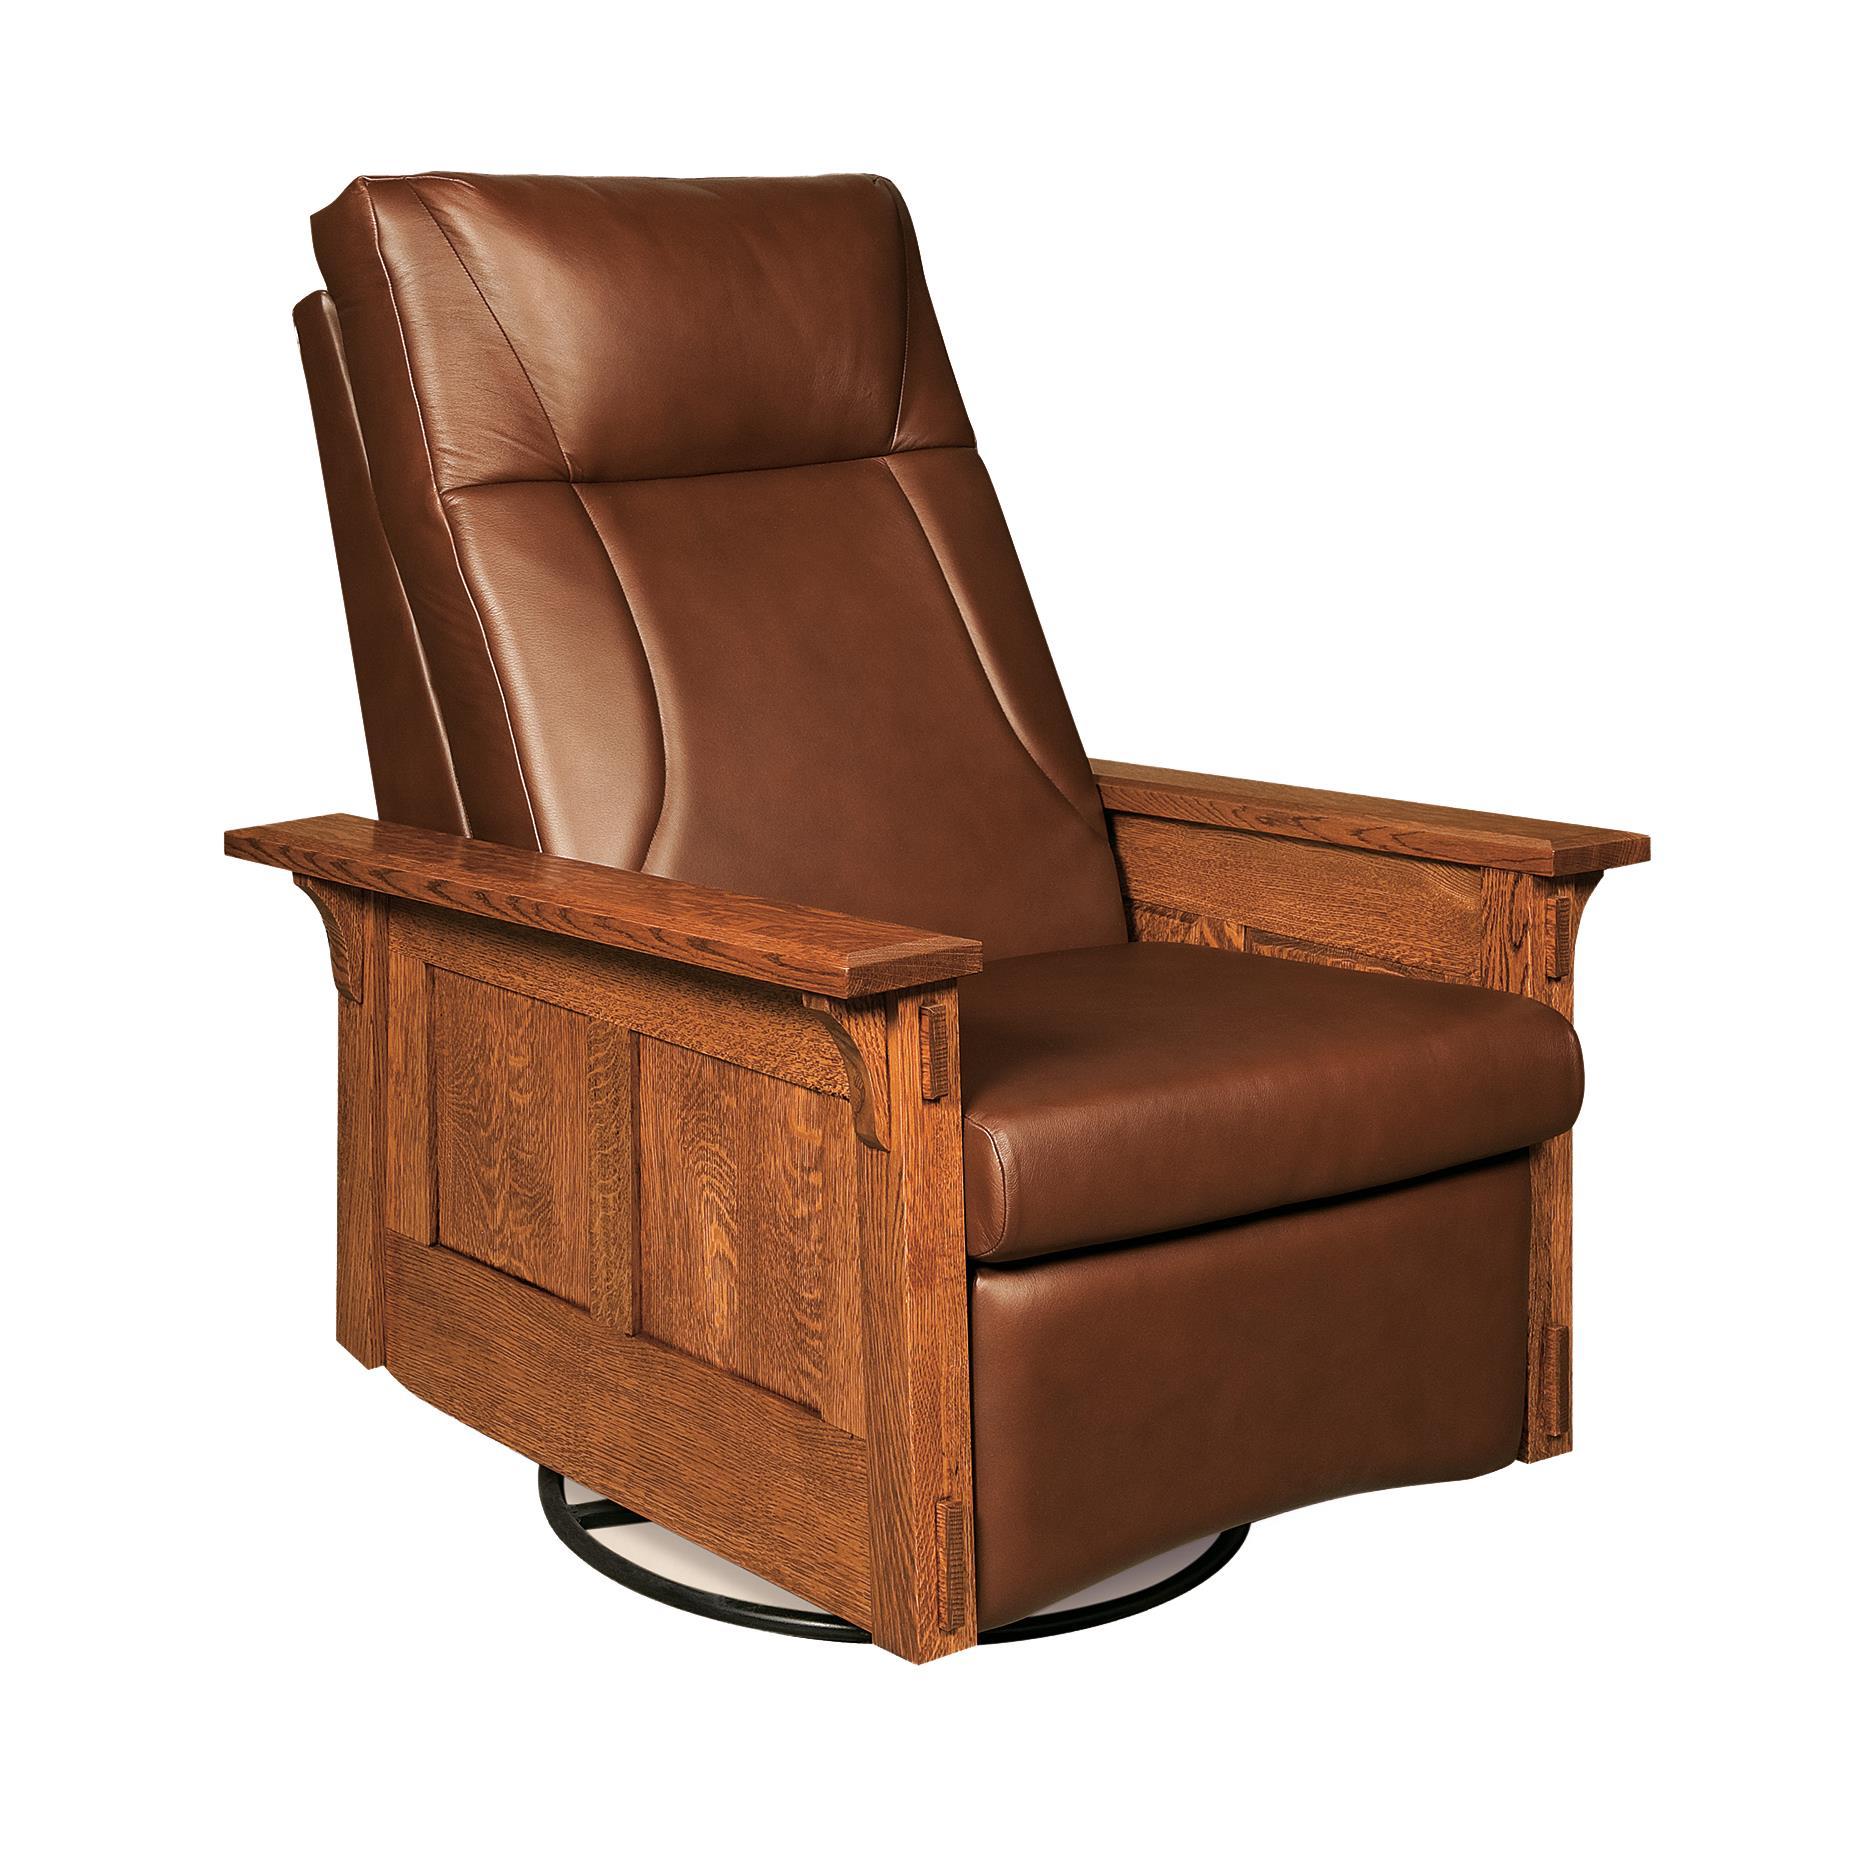 swivel rocker recliner mccoy rocker recliner swivel from dutchcrafters amish furniture QGVAJFT